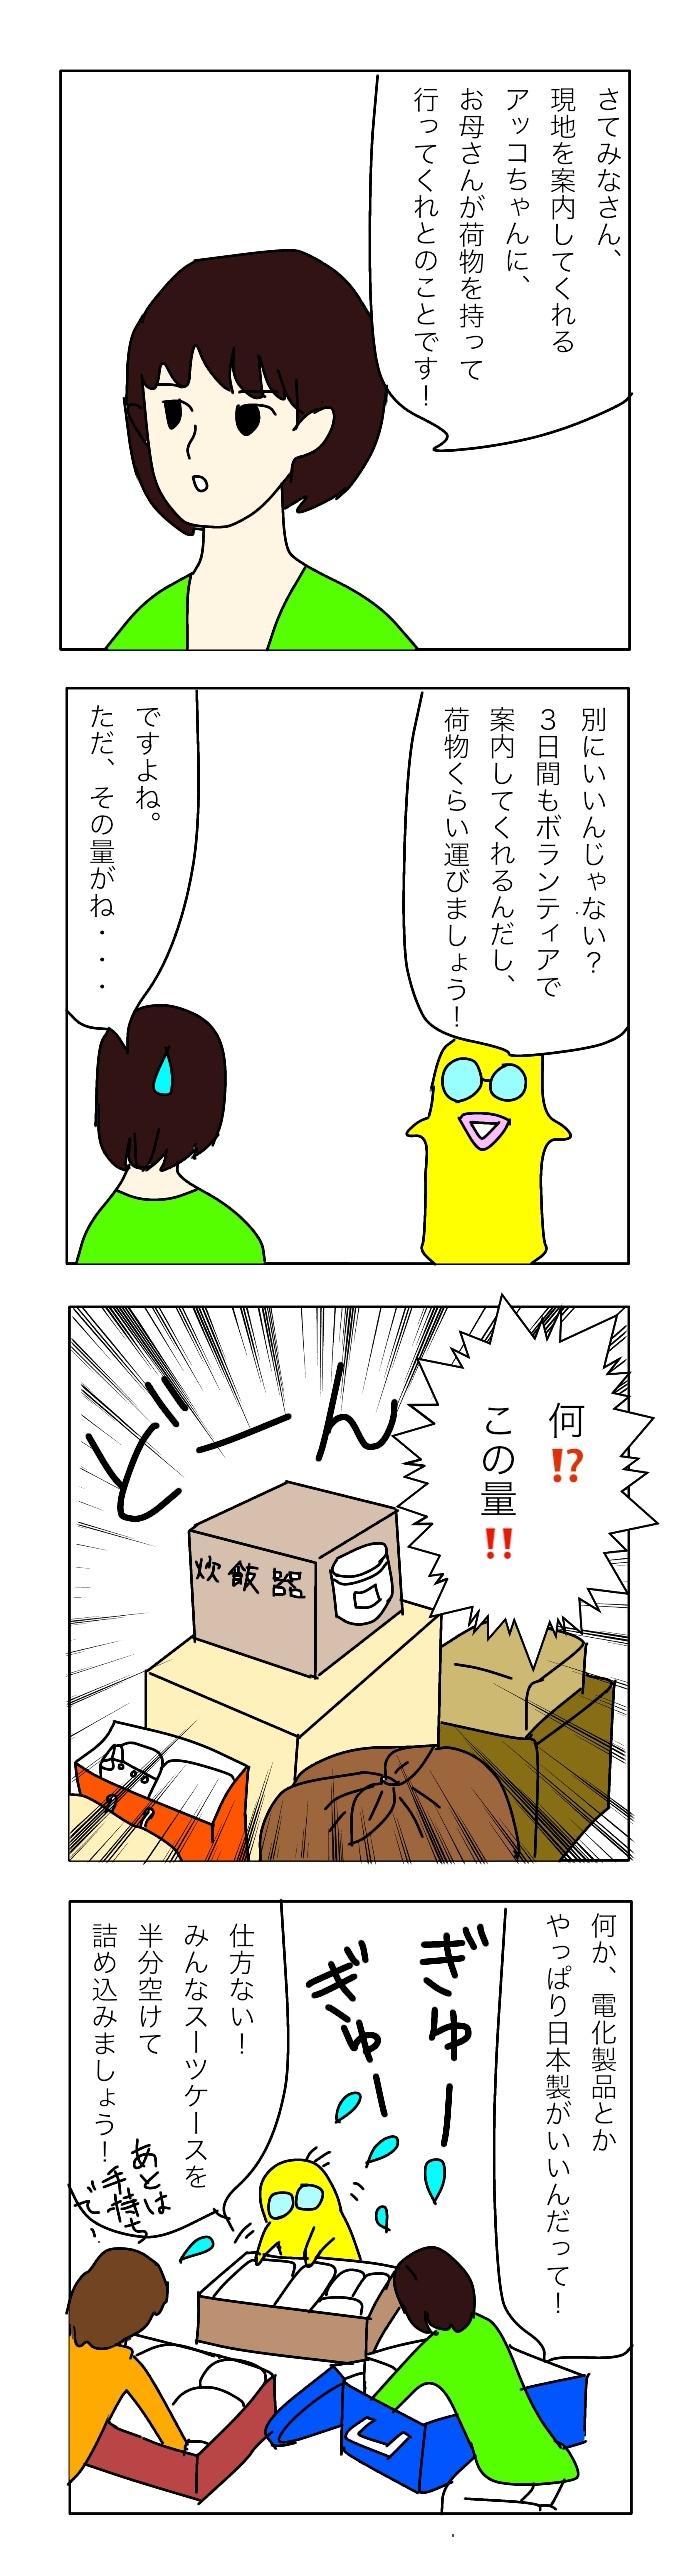 kankoku1 出発前2